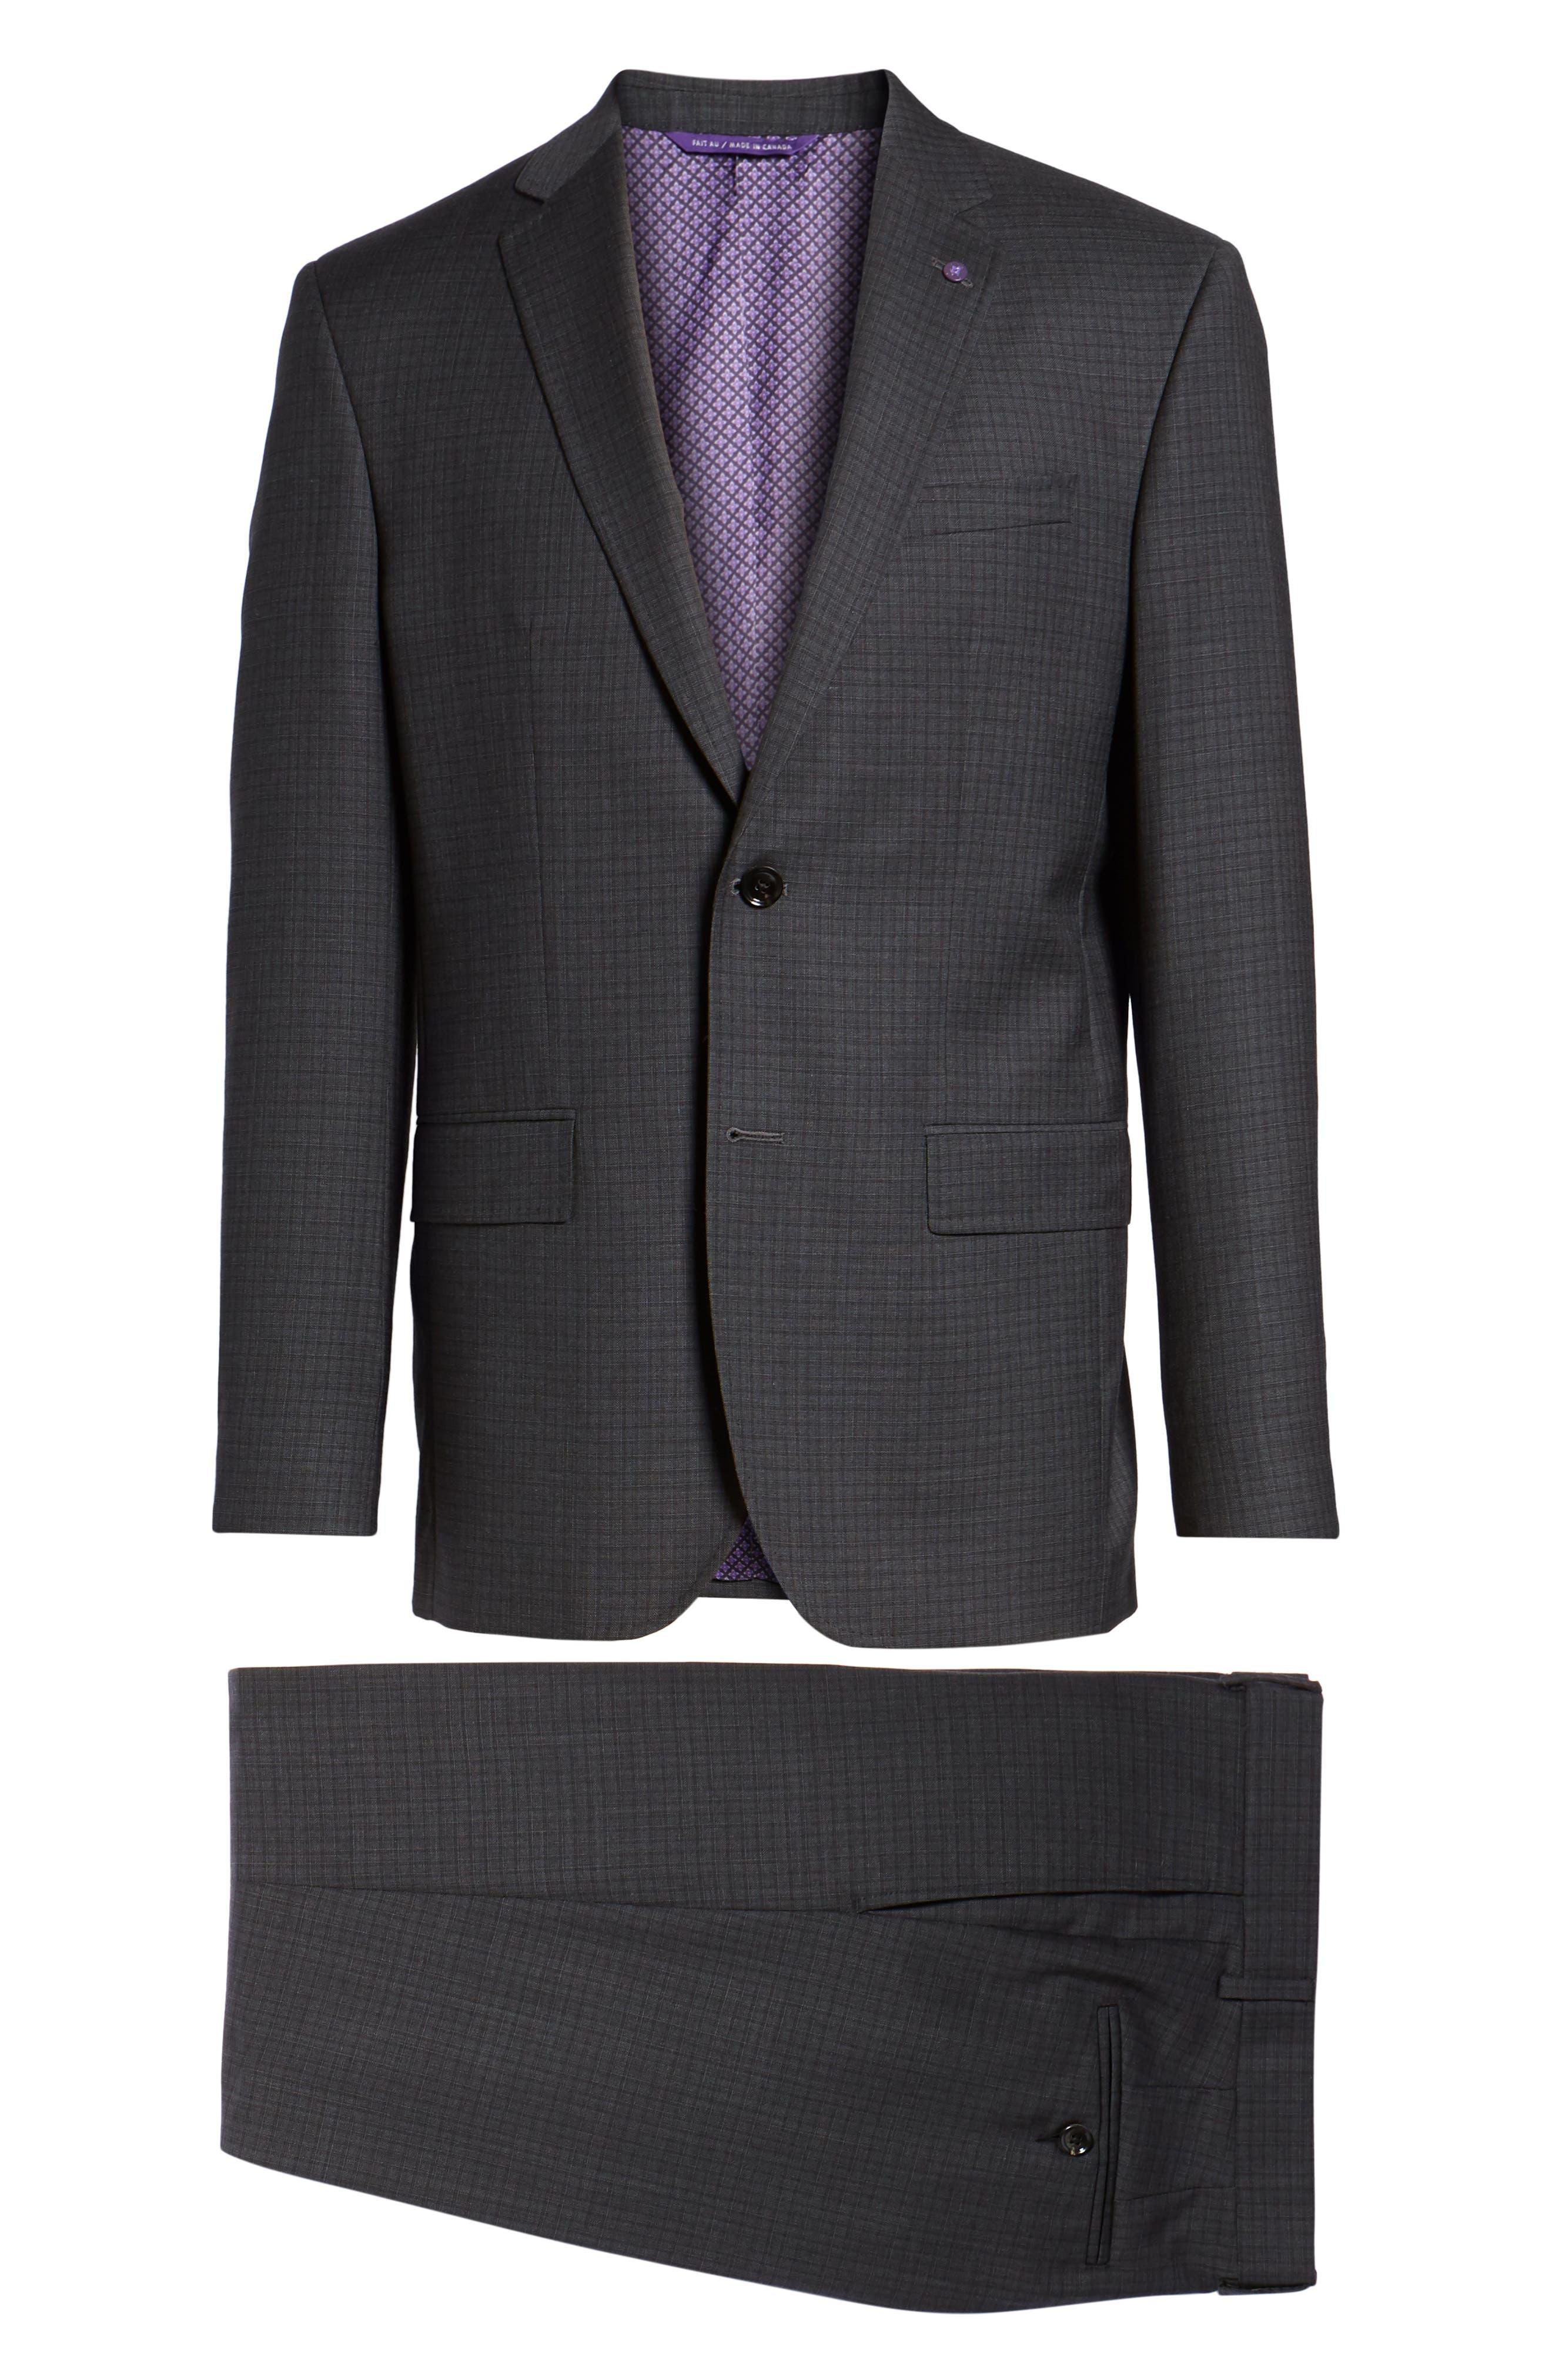 Jay Trim Fit Check Wool Suit,                             Alternate thumbnail 8, color,                             020